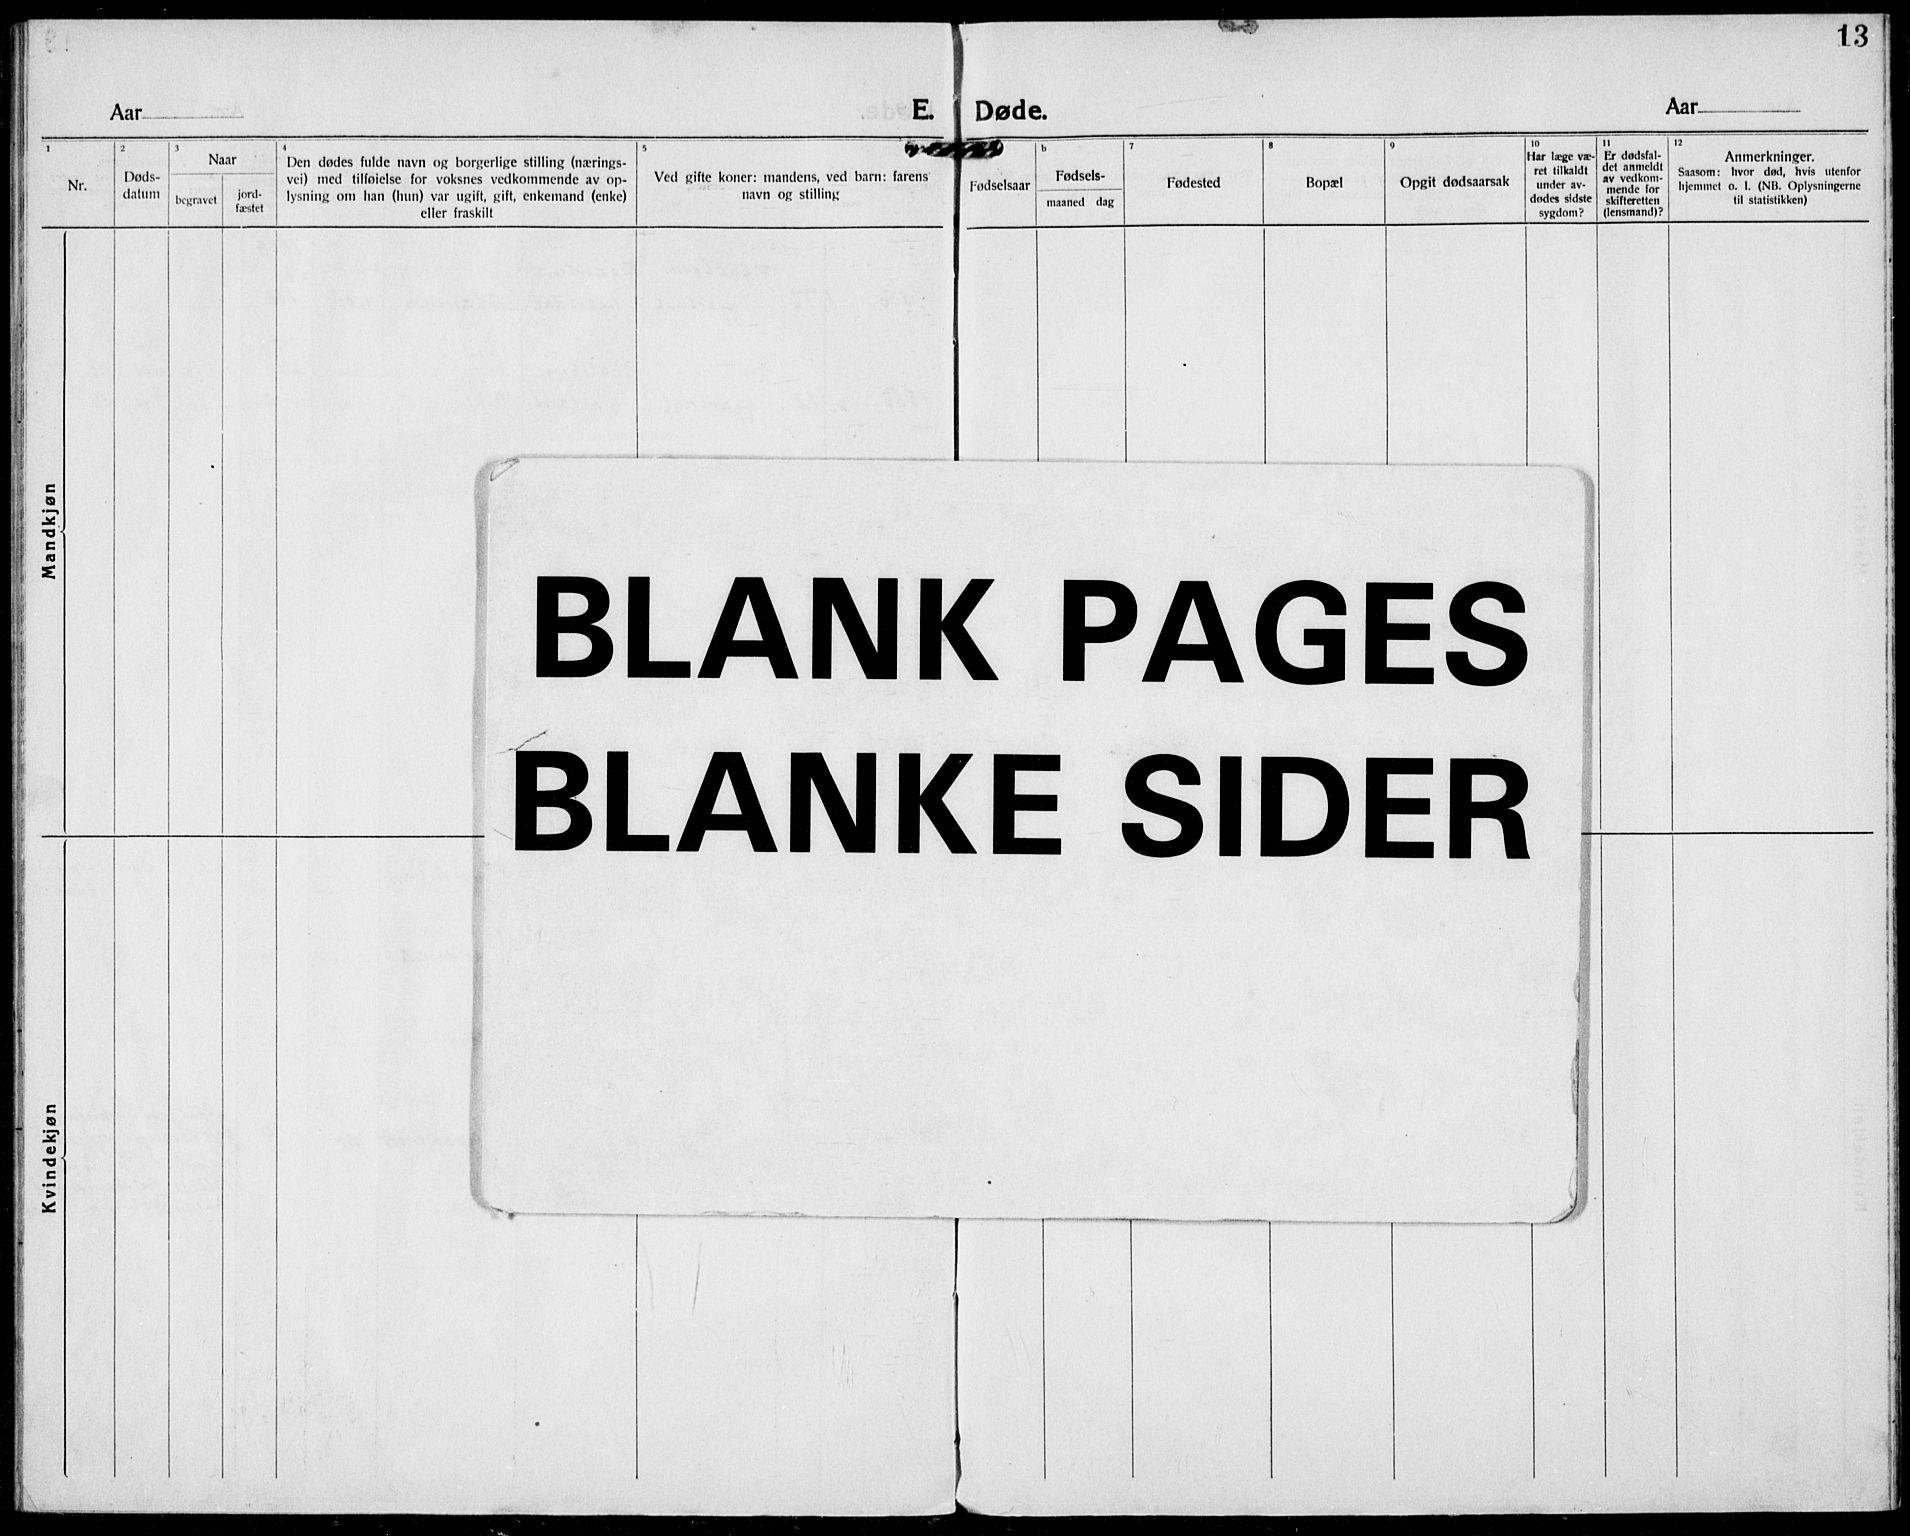 SAKO, Hjartdal kirkebøker, F/Fa/L0012: Ministerialbok nr. I 12, 1923-1930, s. 13